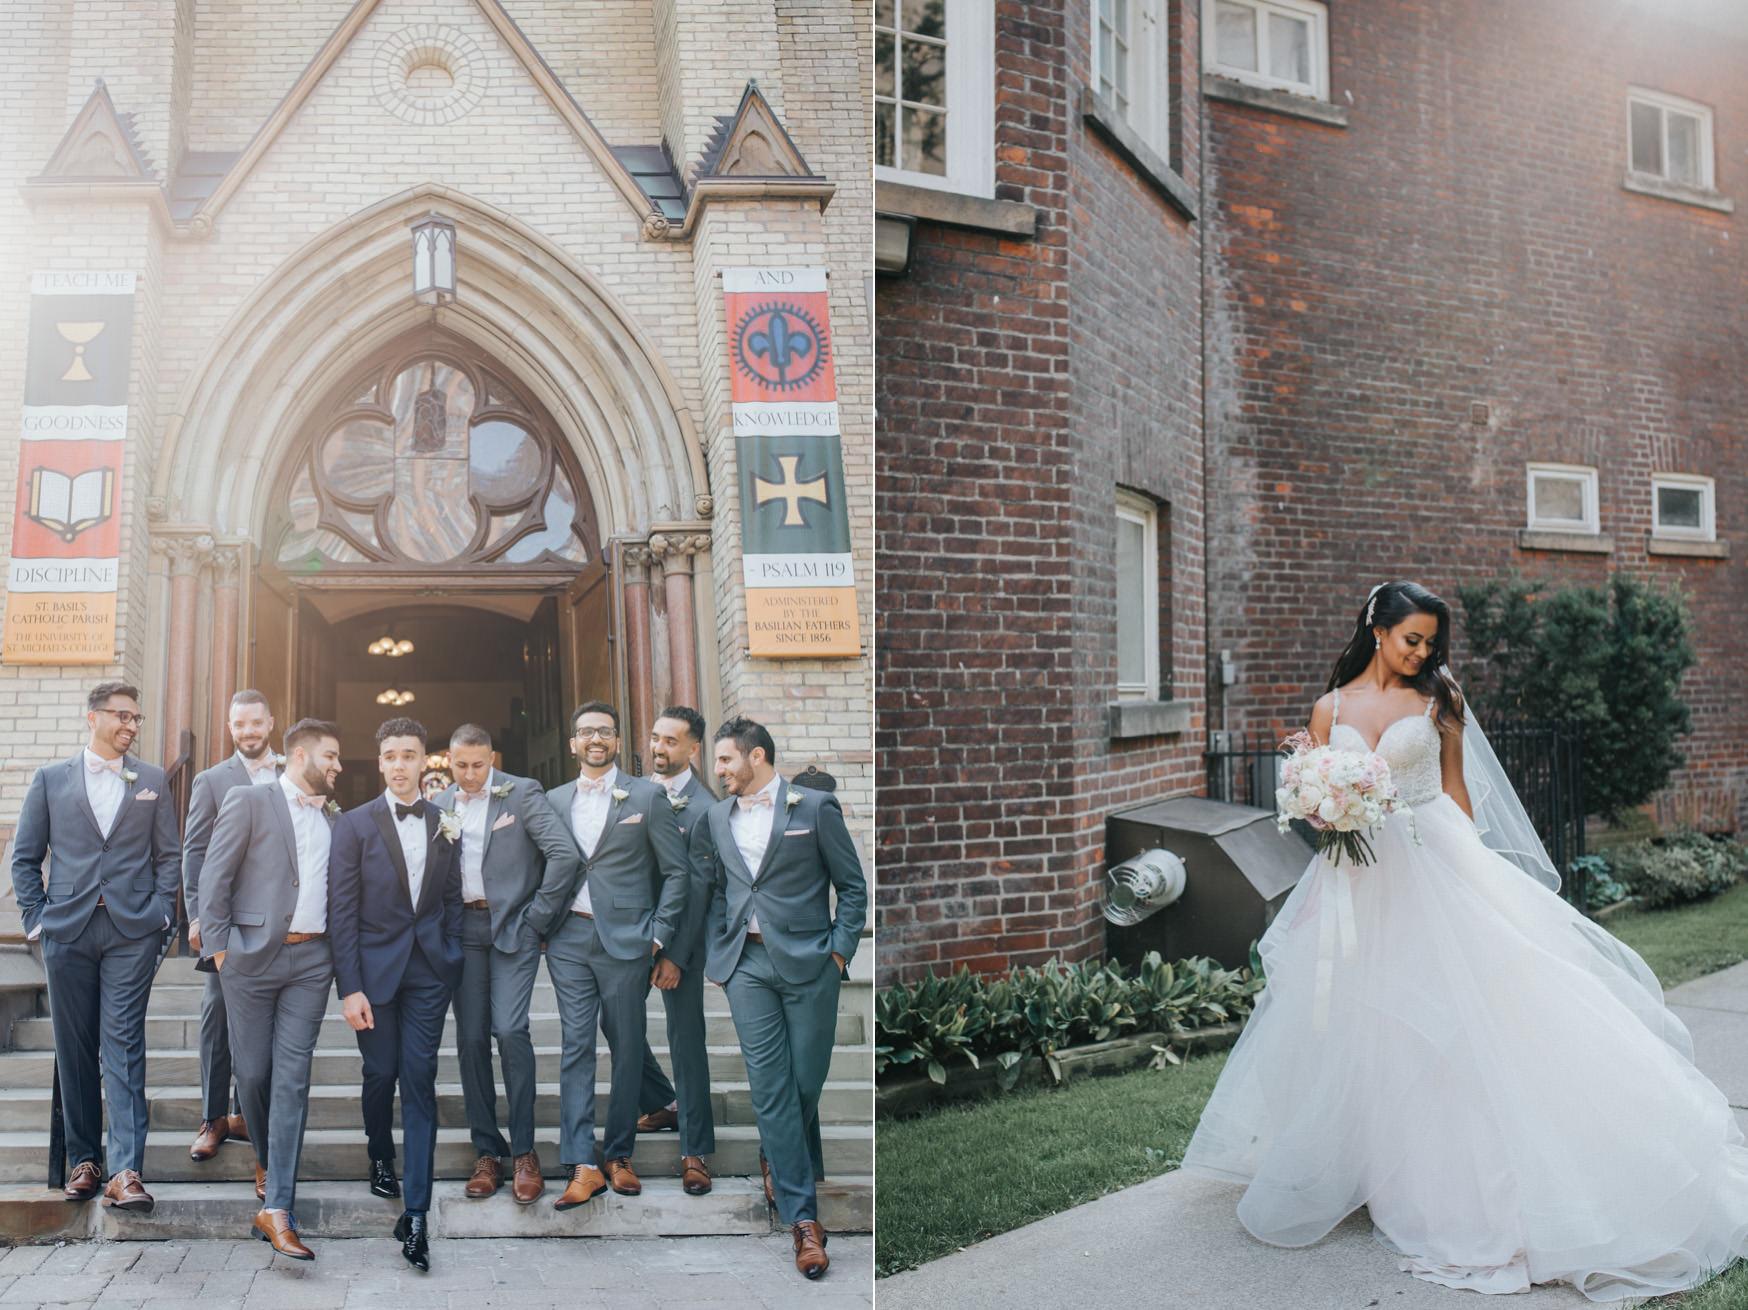 Toronto Victoria University Wedding Photo